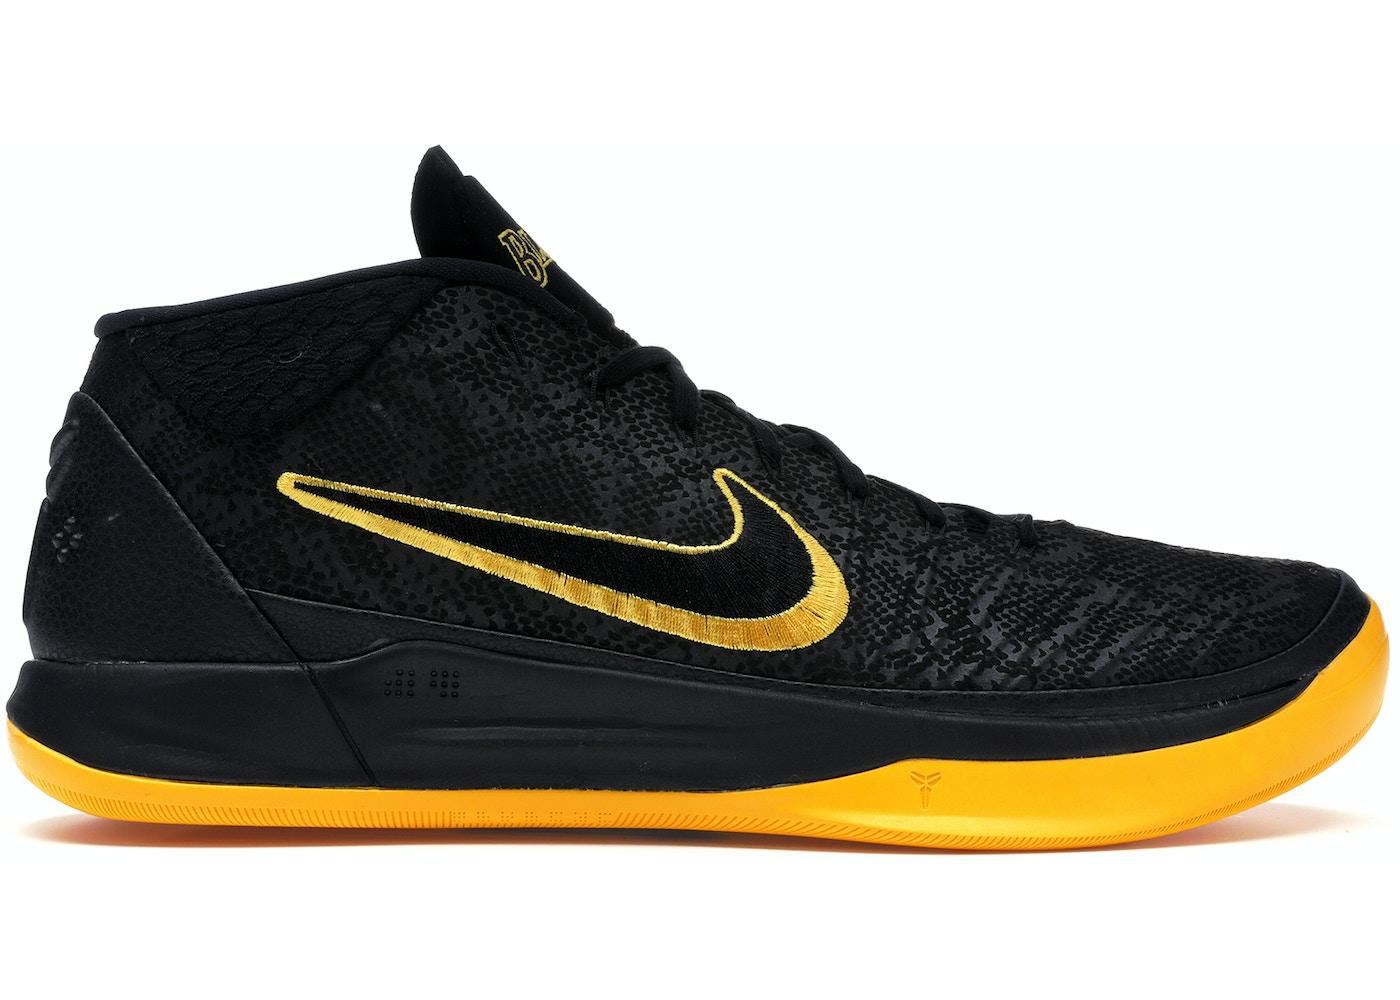 Nike Kobe A D Lakers Black Mamba Aq5164 001 Aq5163 001